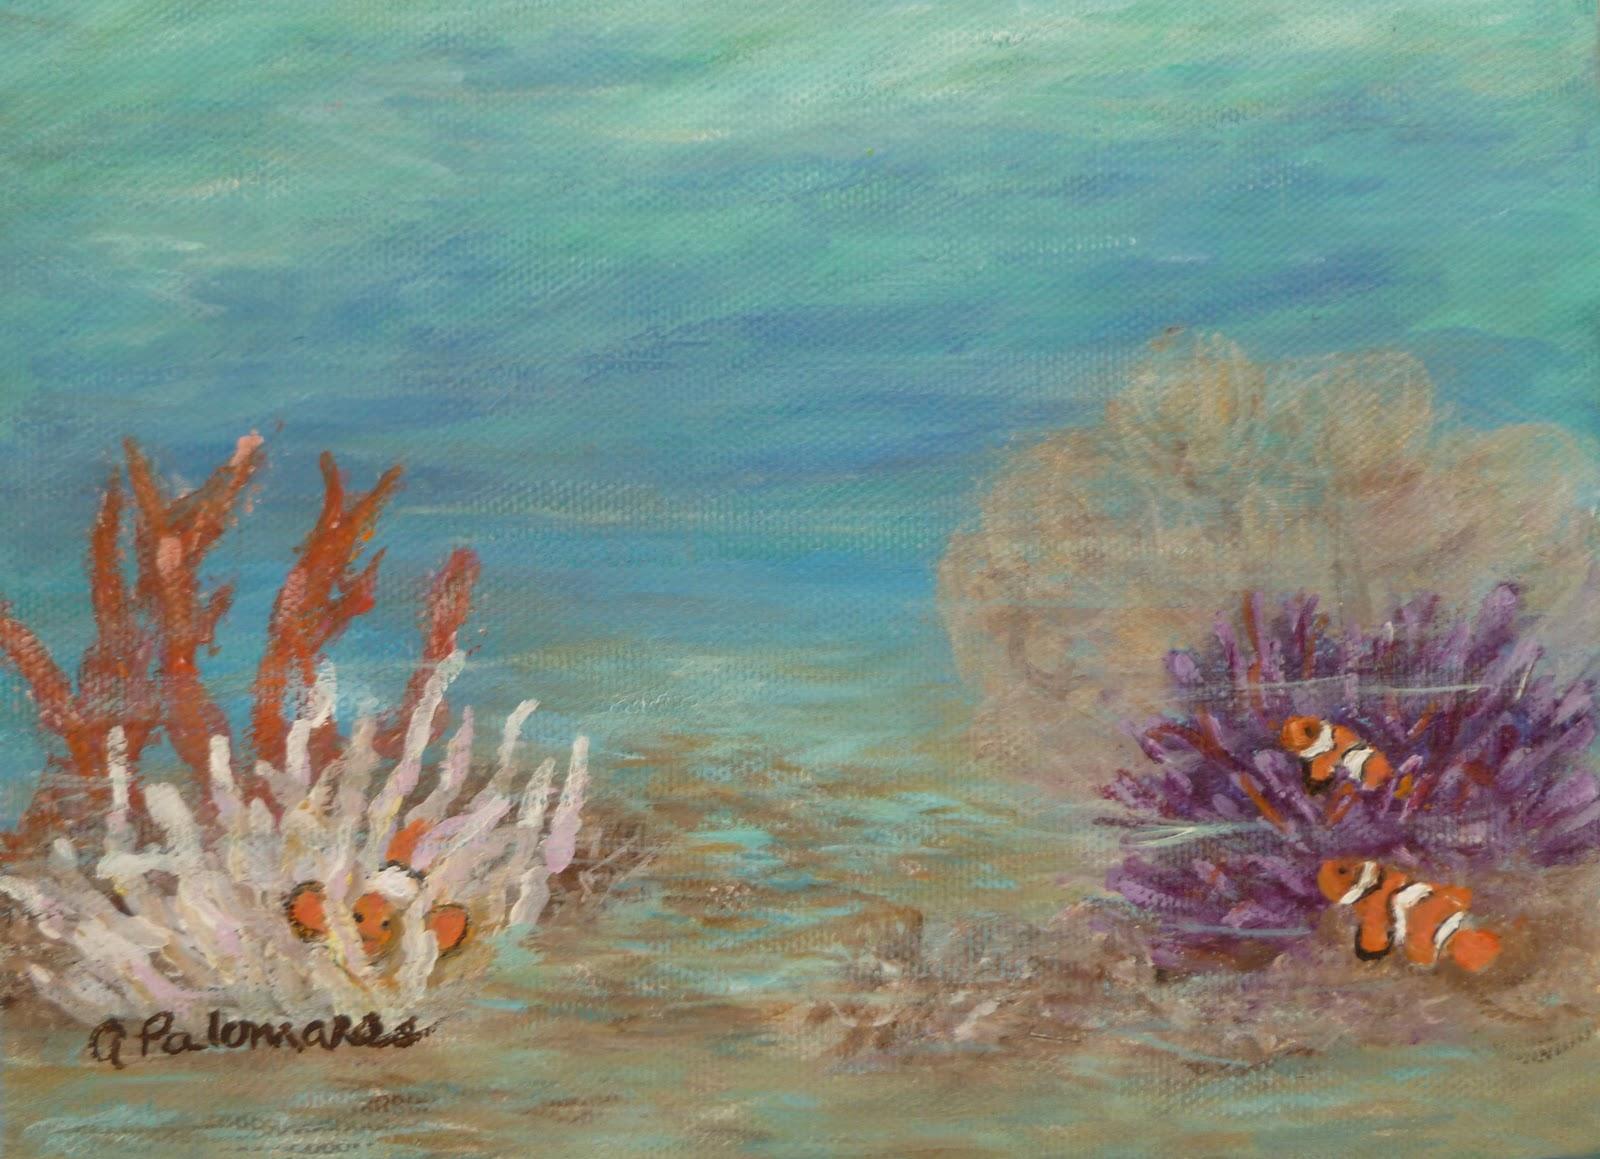 Clownfish Underwater Painting | Amber Palomares Coastal ...